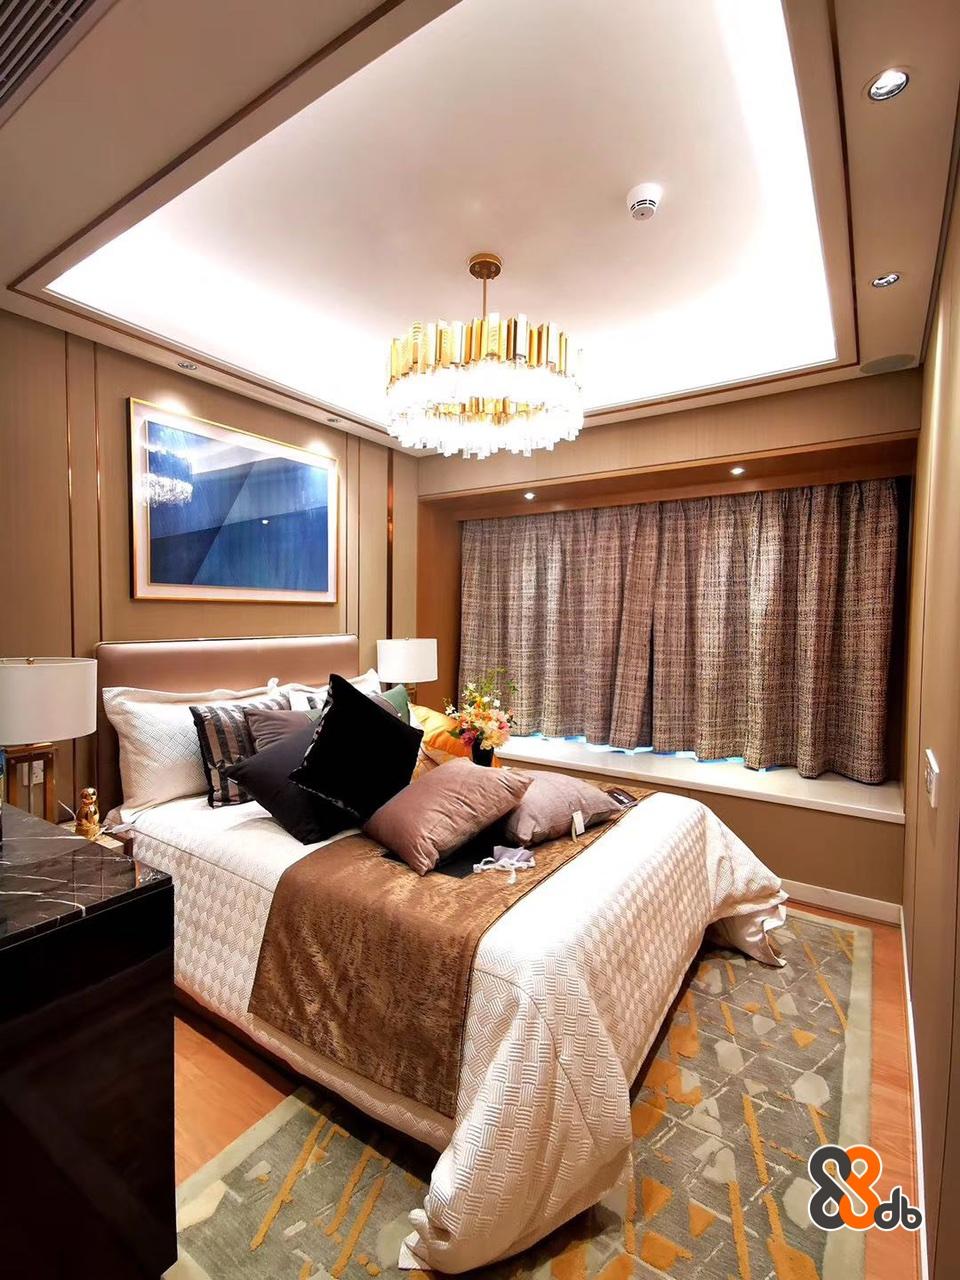 Bedroom,Room,Ceiling,Furniture,Interior design